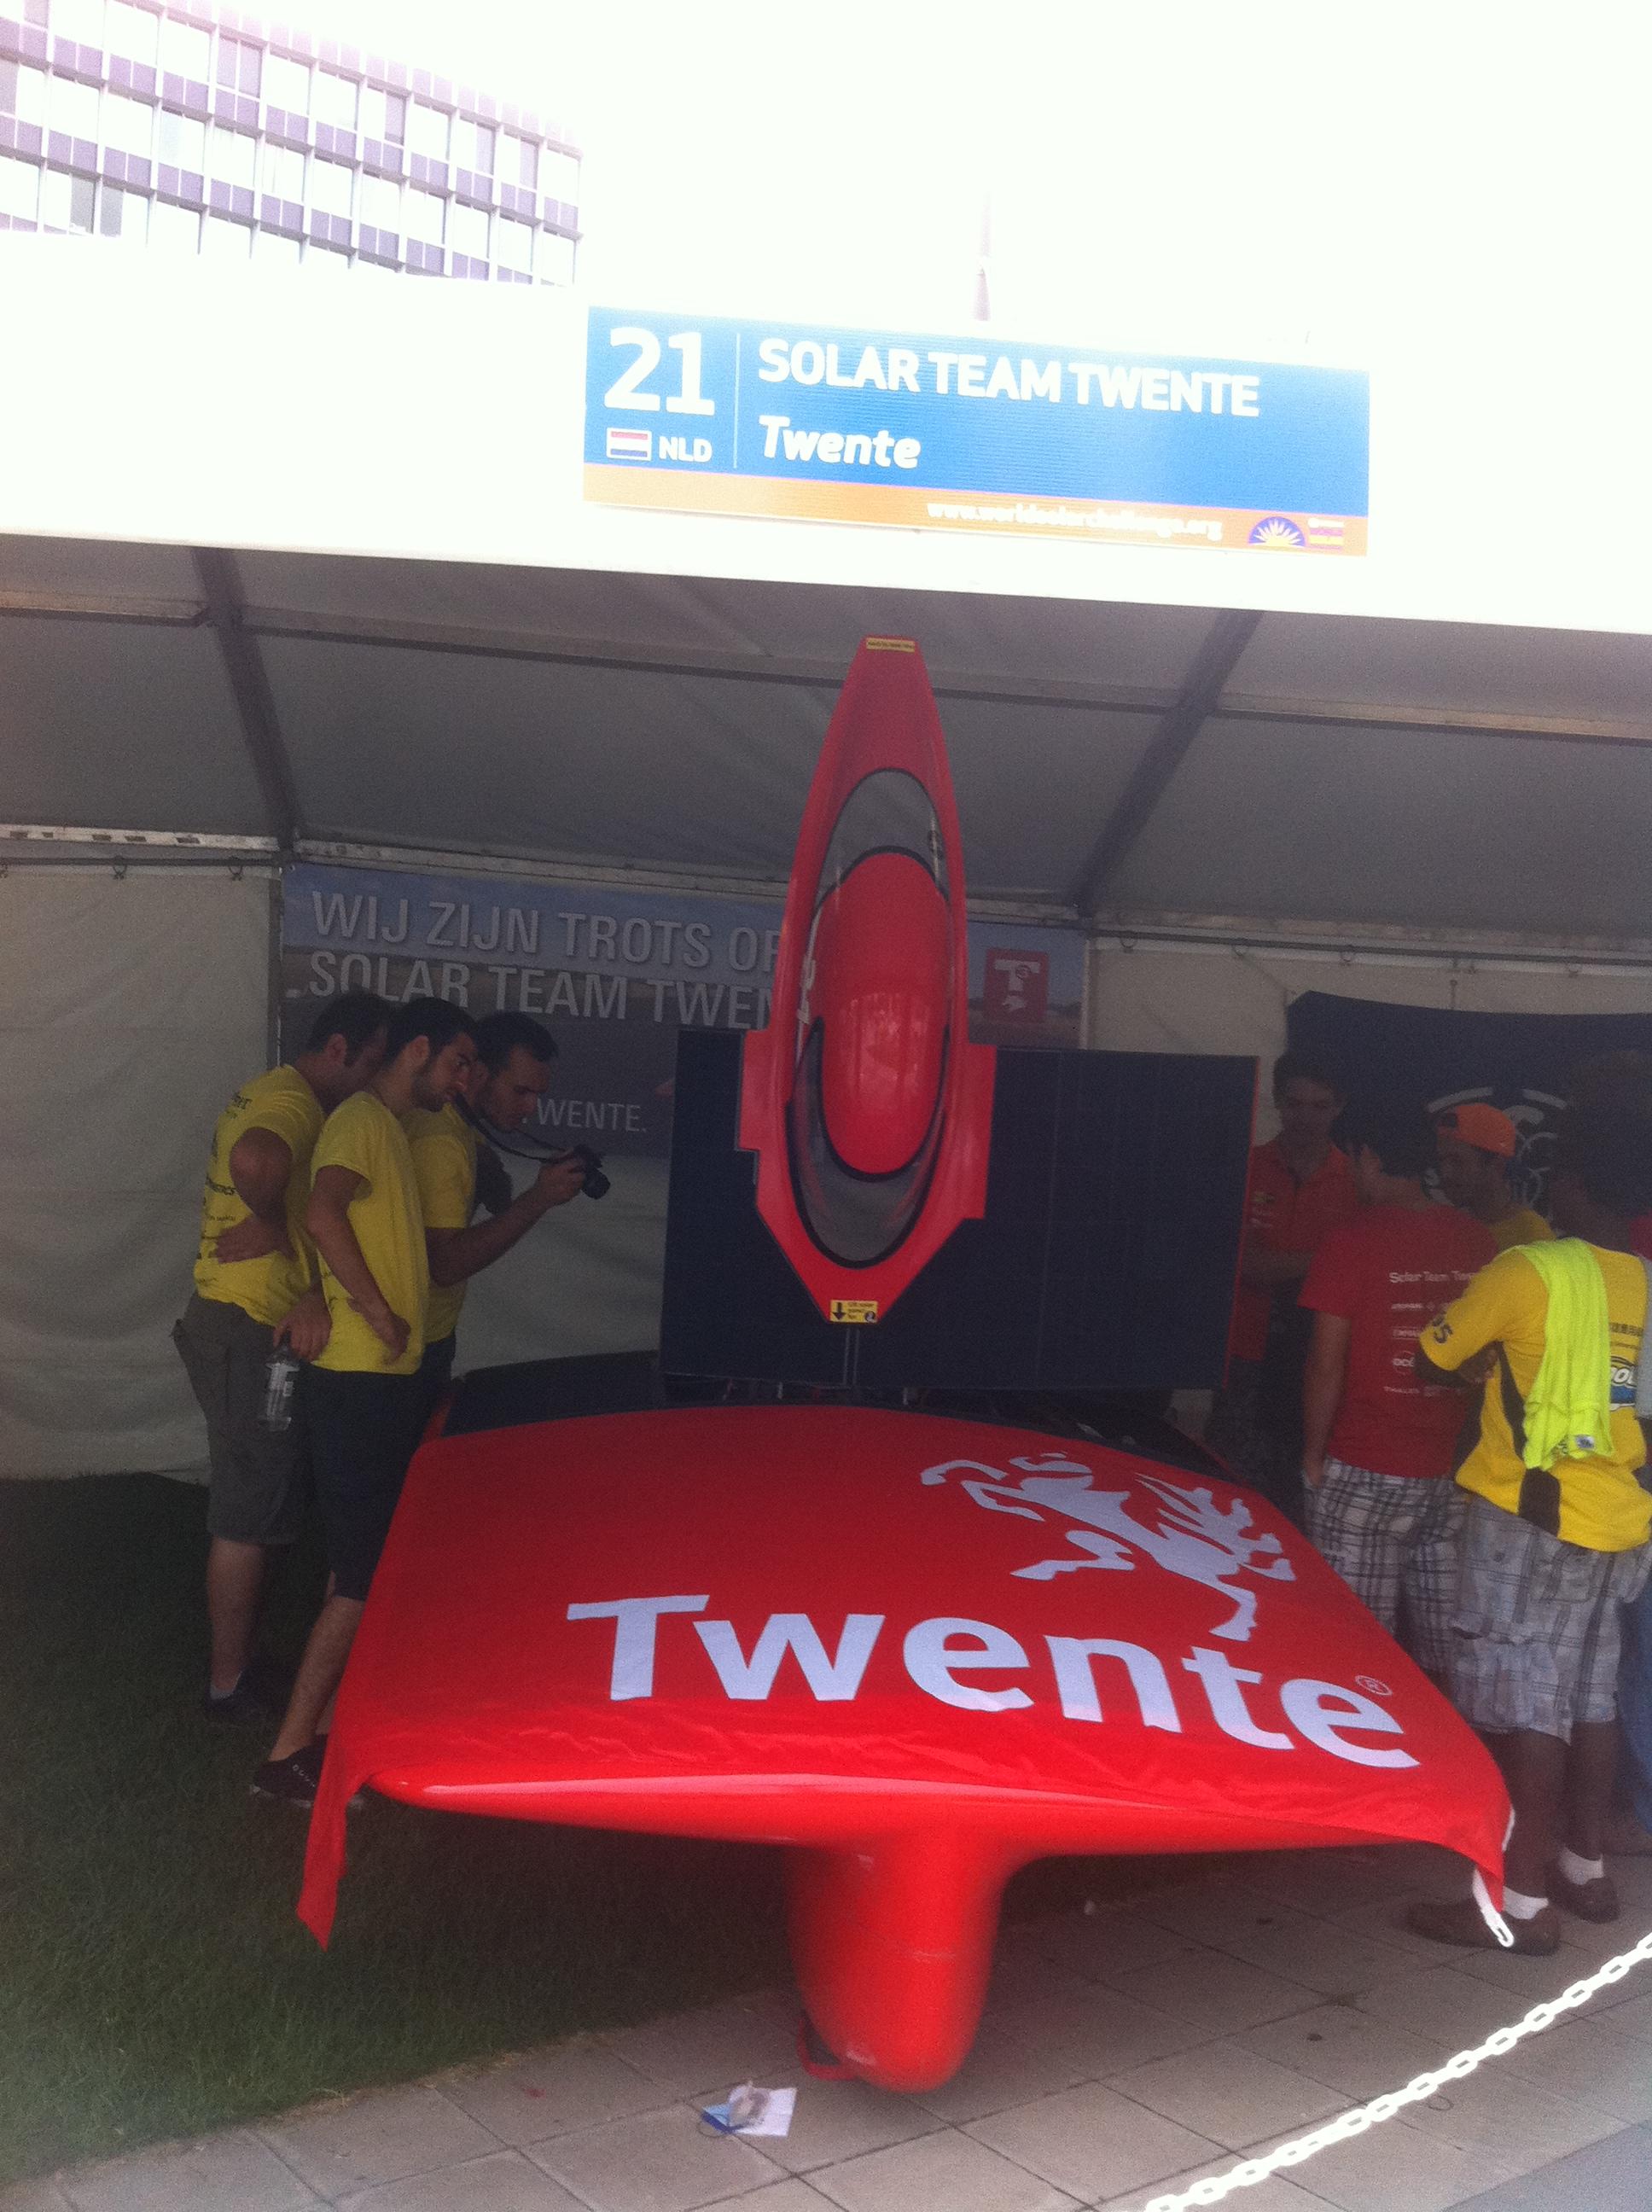 Solar Team Twente's 21 Connect (Netherlands), 5th Arriving Winner at Adelaide, Australia